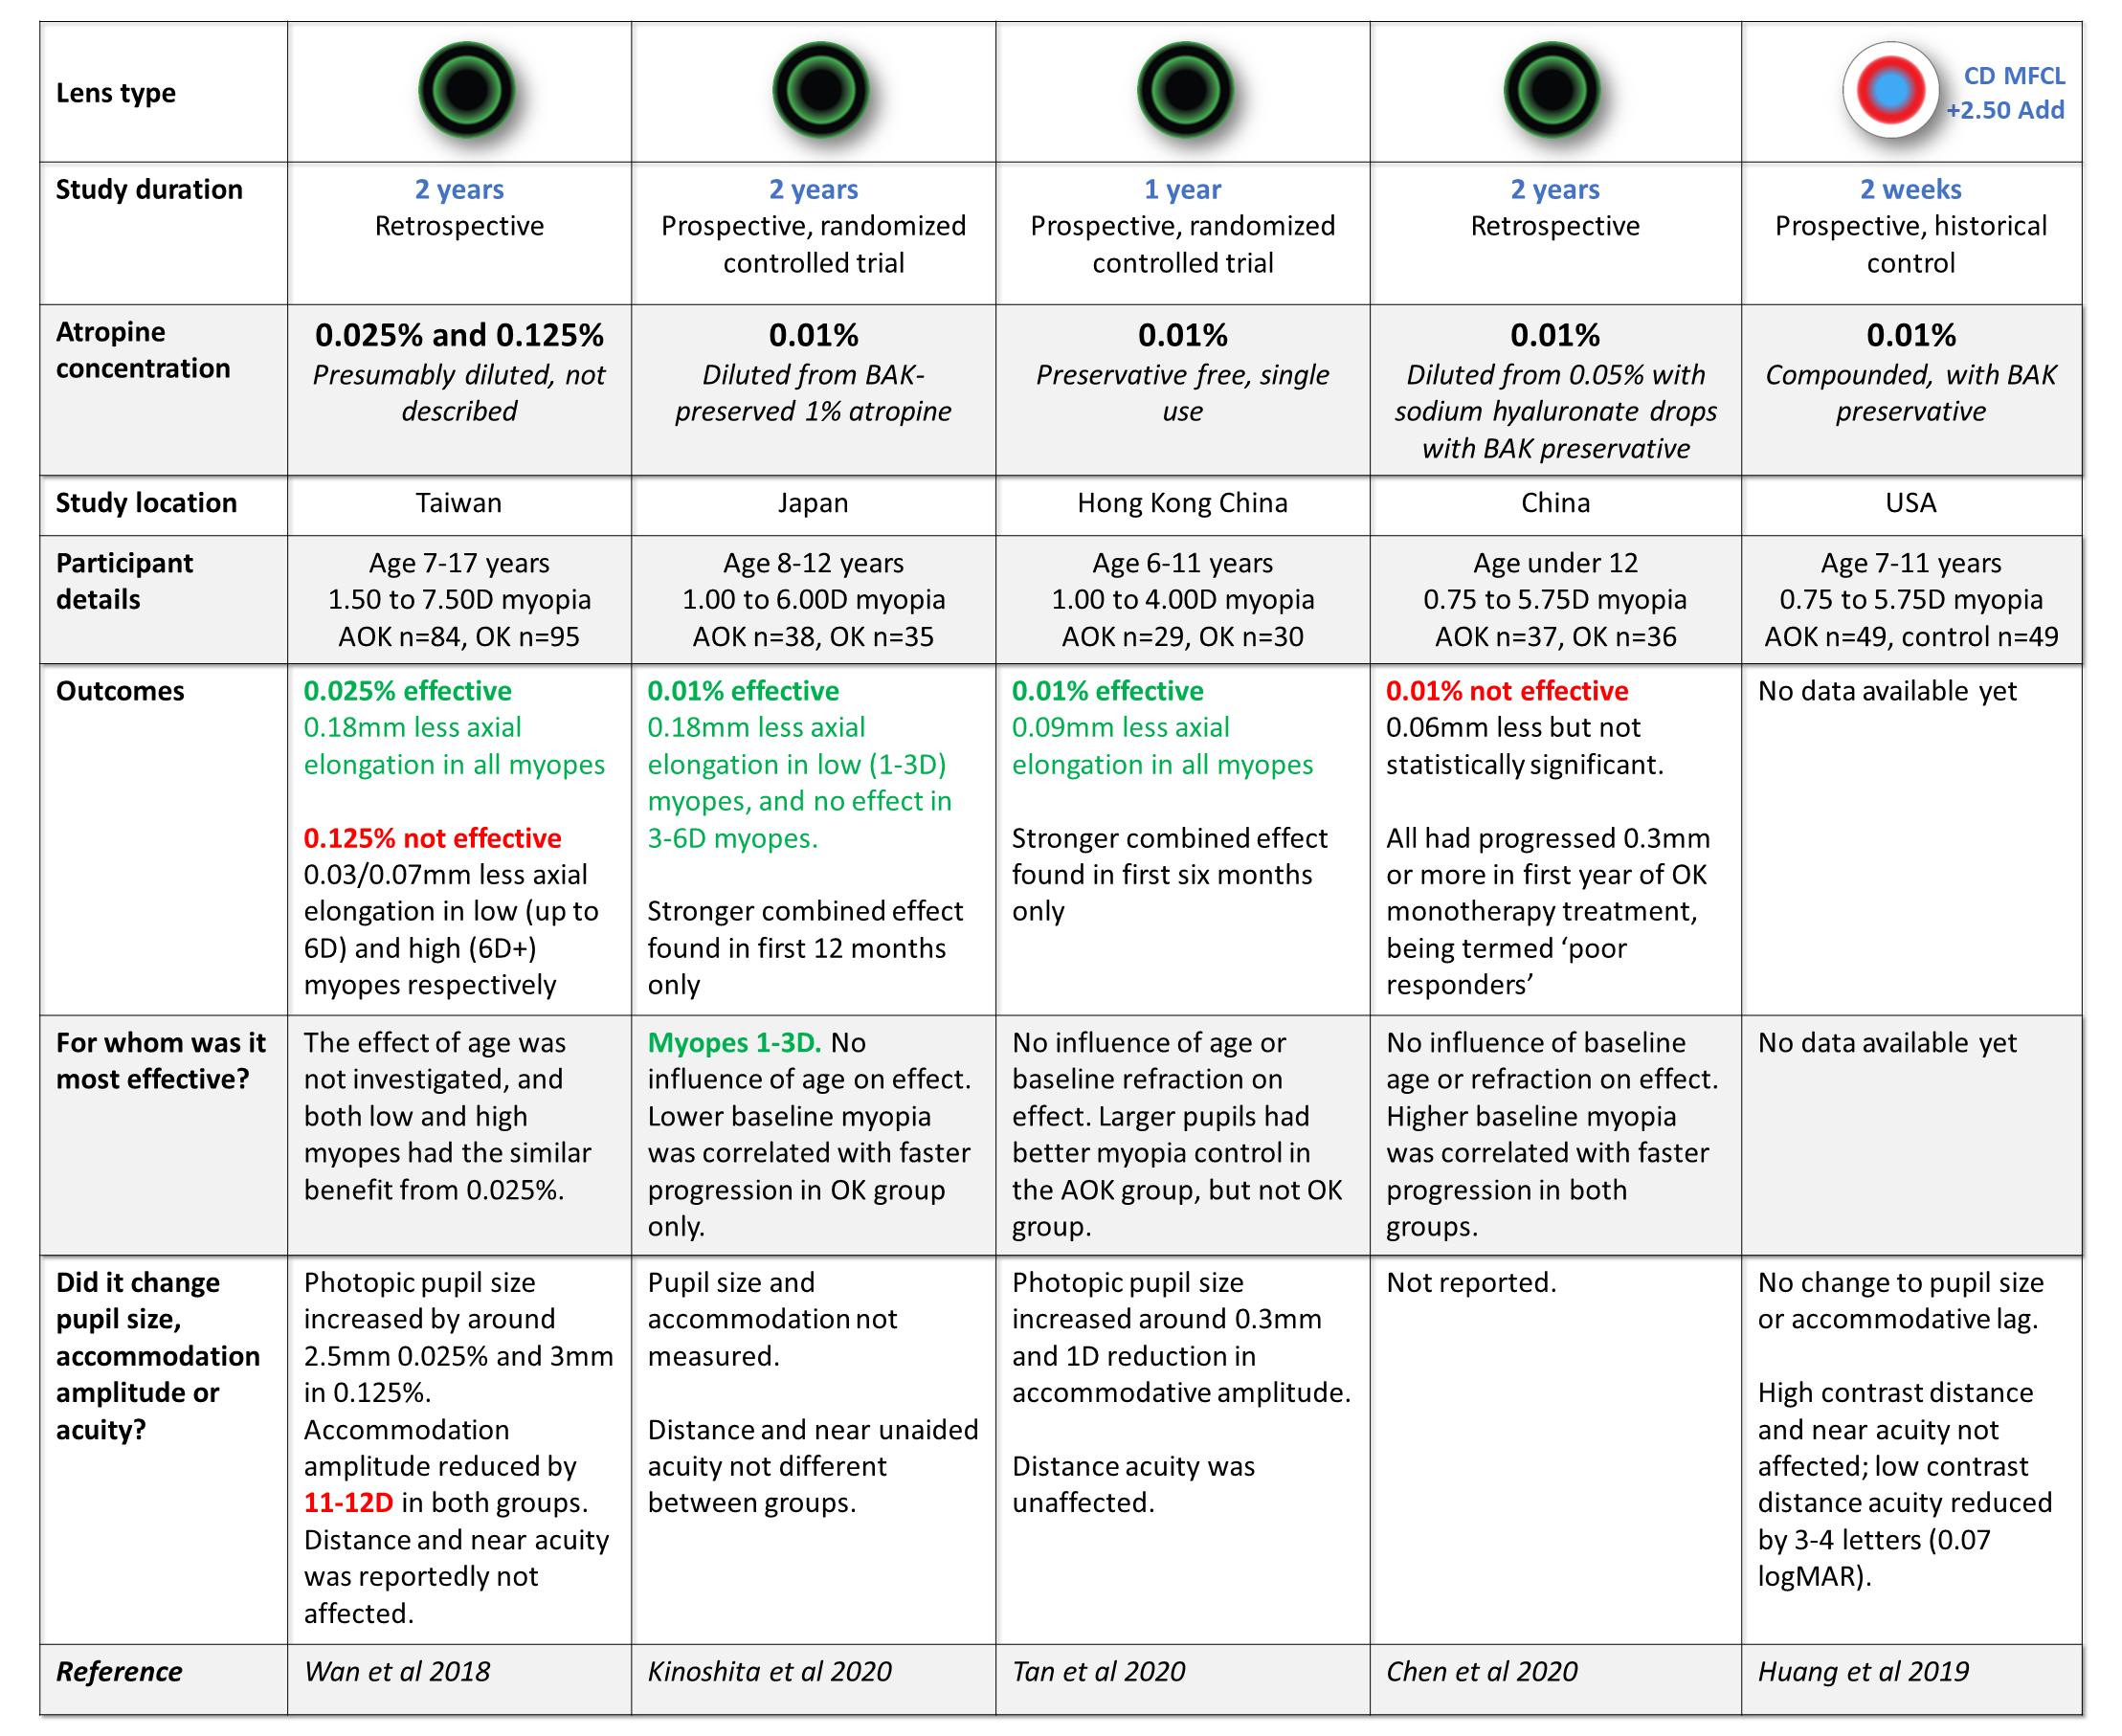 AOK summary table with shadow